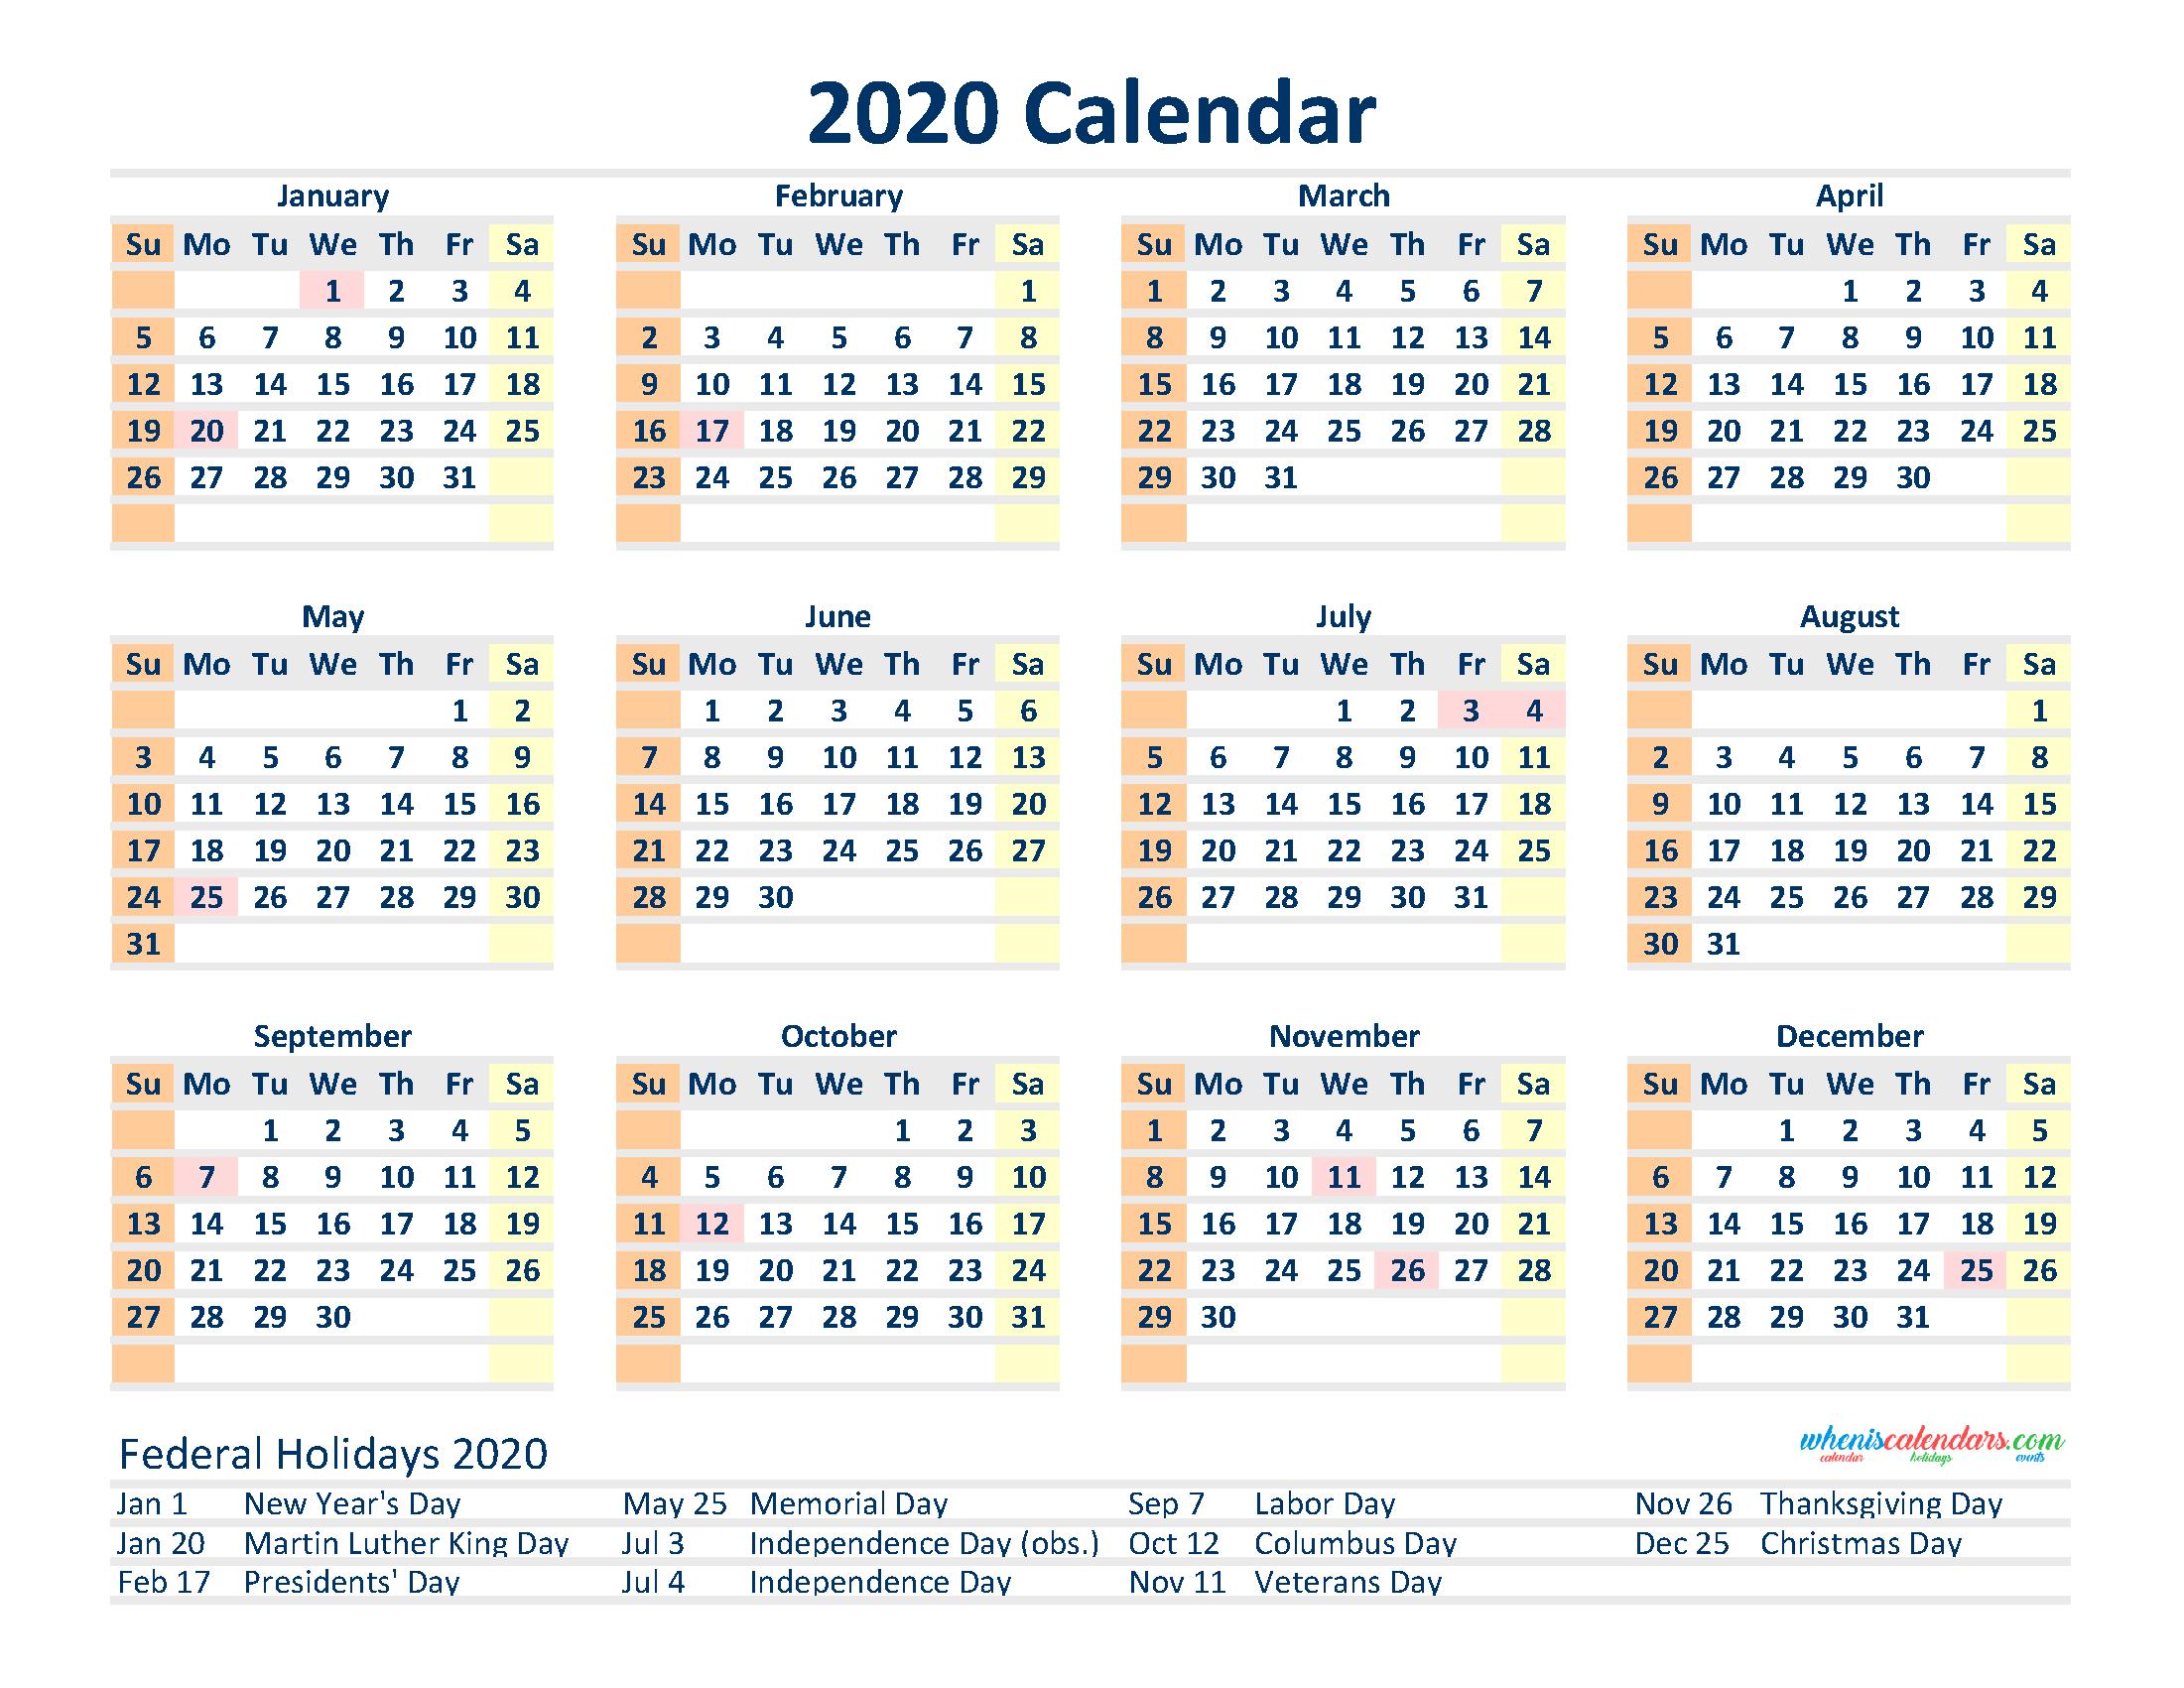 Free 2020 12 Month Calendar Printable Pdf, Excel, Image  12 Month Printable Calendar Template